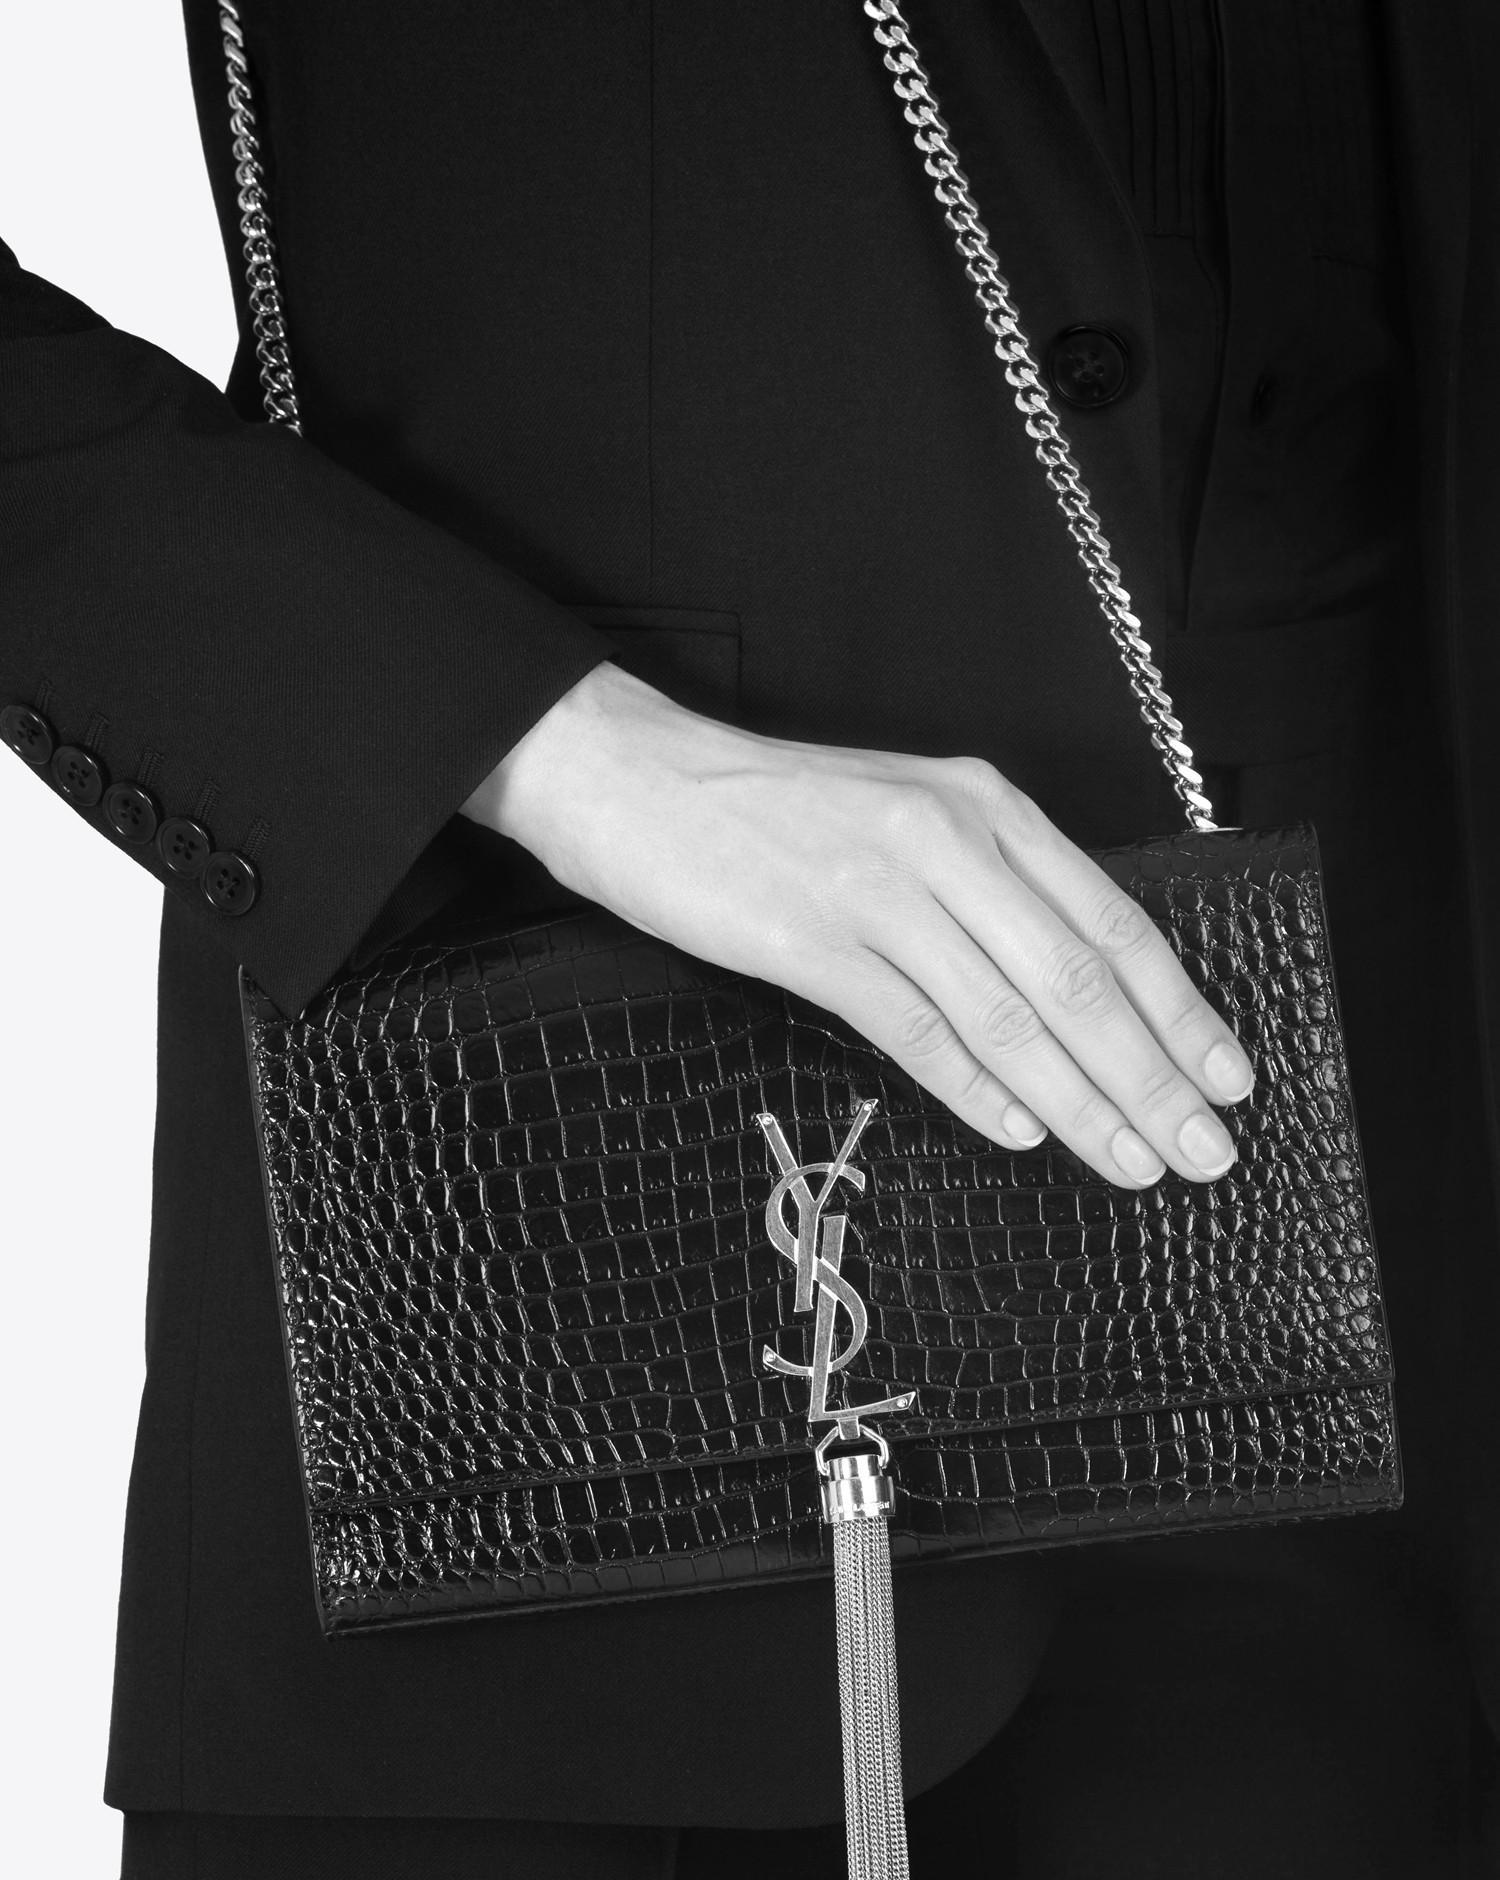 fbdb0e2d77 Saint Laurent Classic Medium Kate Monogram Croc-Embossed Leather ...